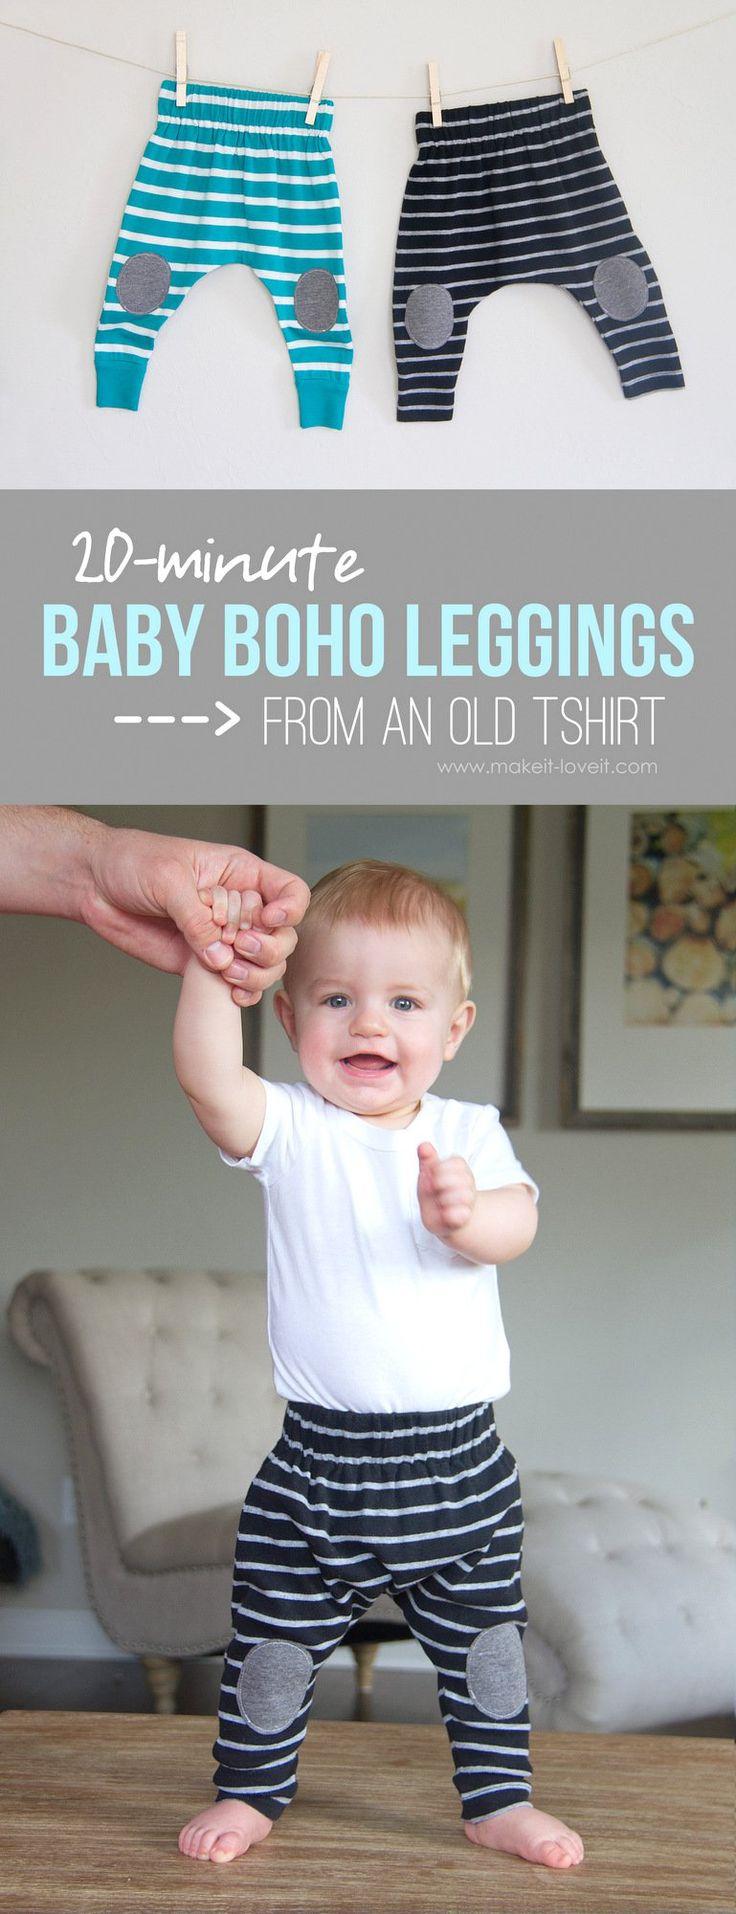 20 minutos bebé Boho Leggings (... de una camisa vieja) !!